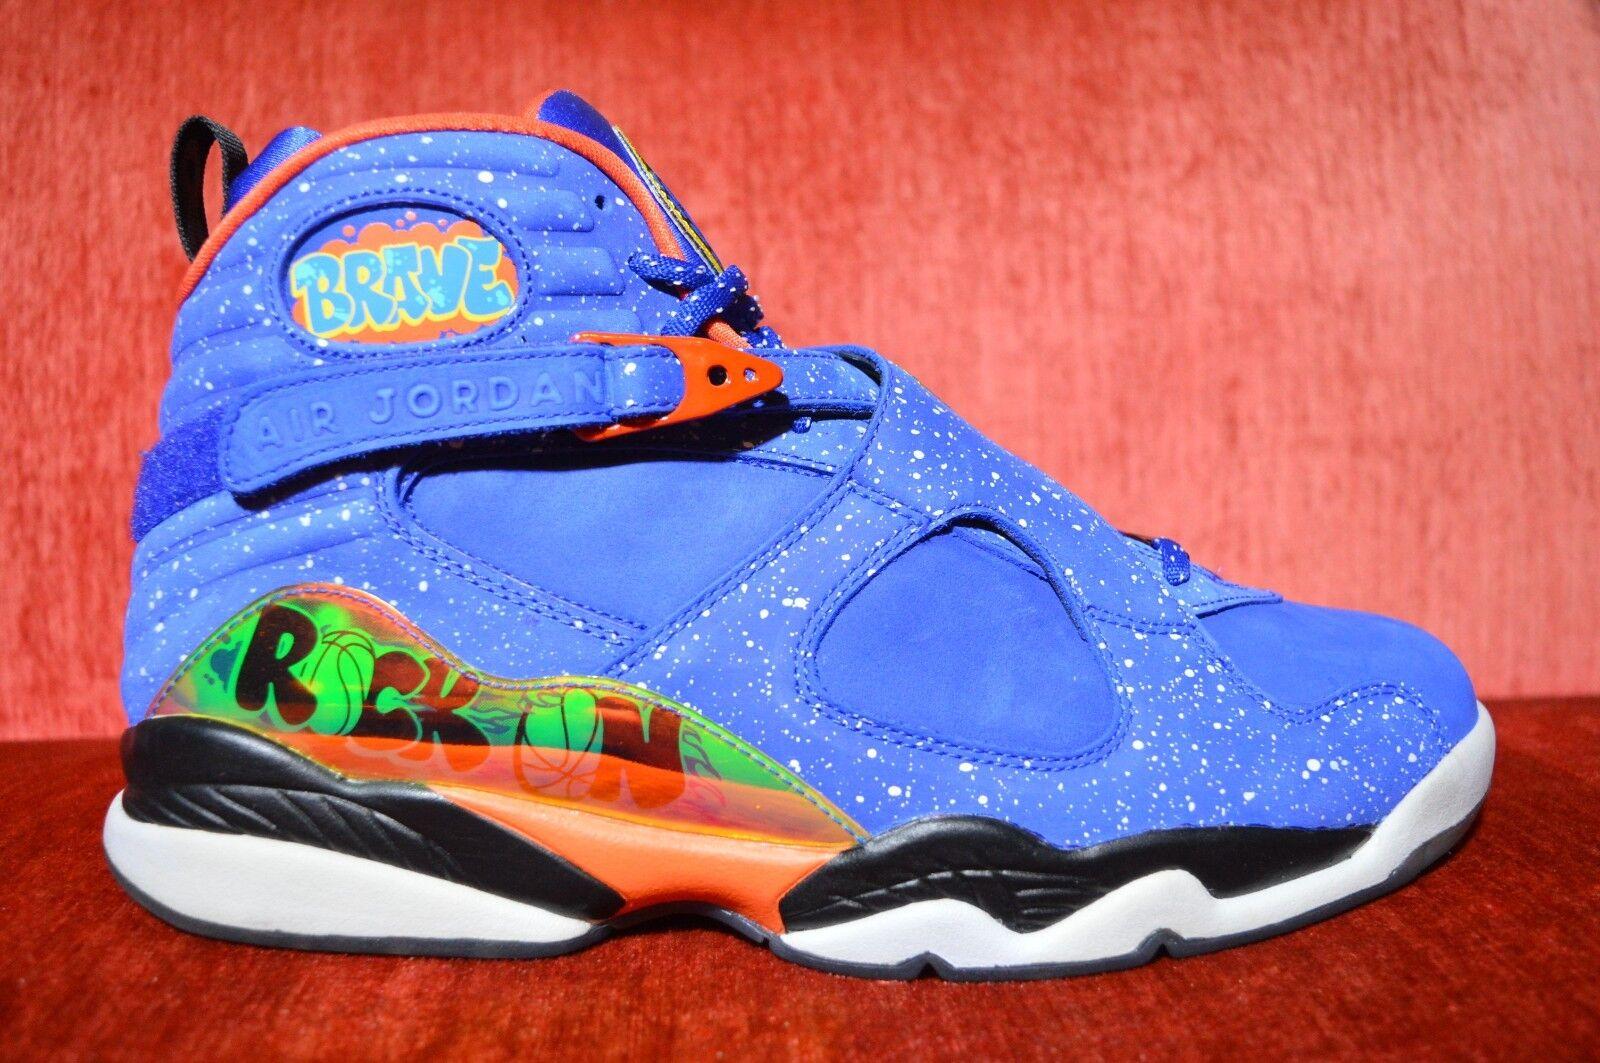 WORN 2X Nike AIR Jordan Retro 8 DB DOERNBECHER DB Size 11.5 VIII 2014 729893 480